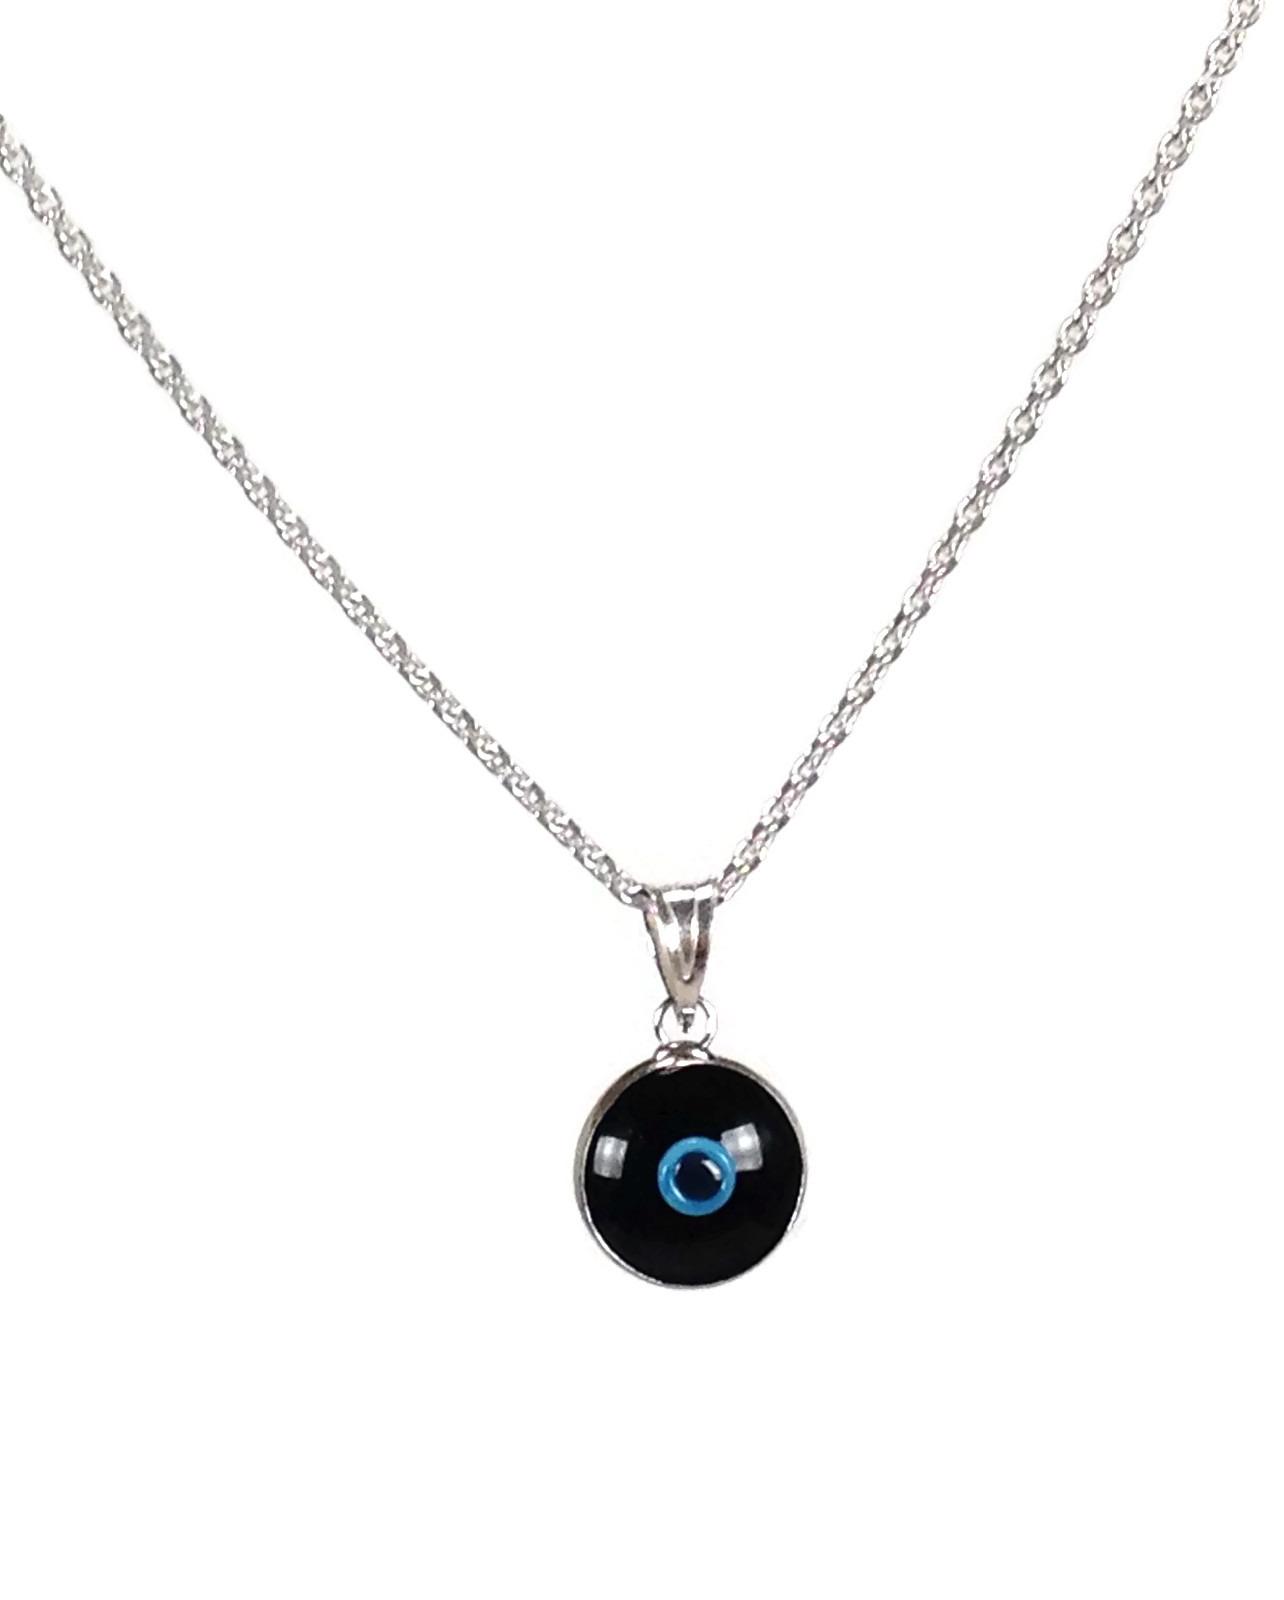 black evil eye pendant necklace